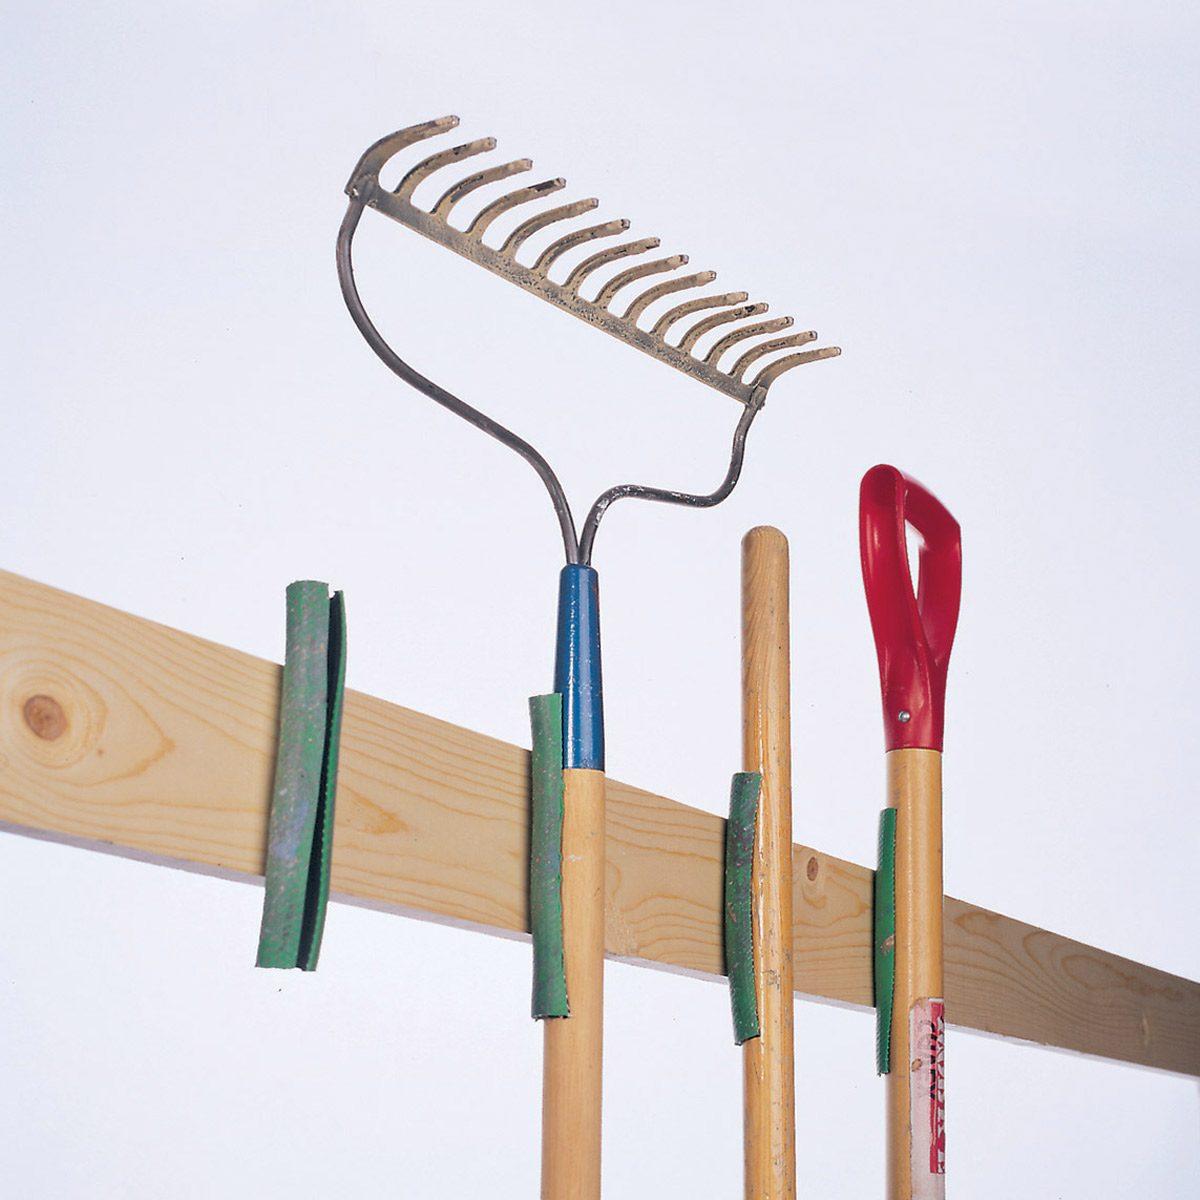 FH98MAR_01268002 garage organizer tools rake